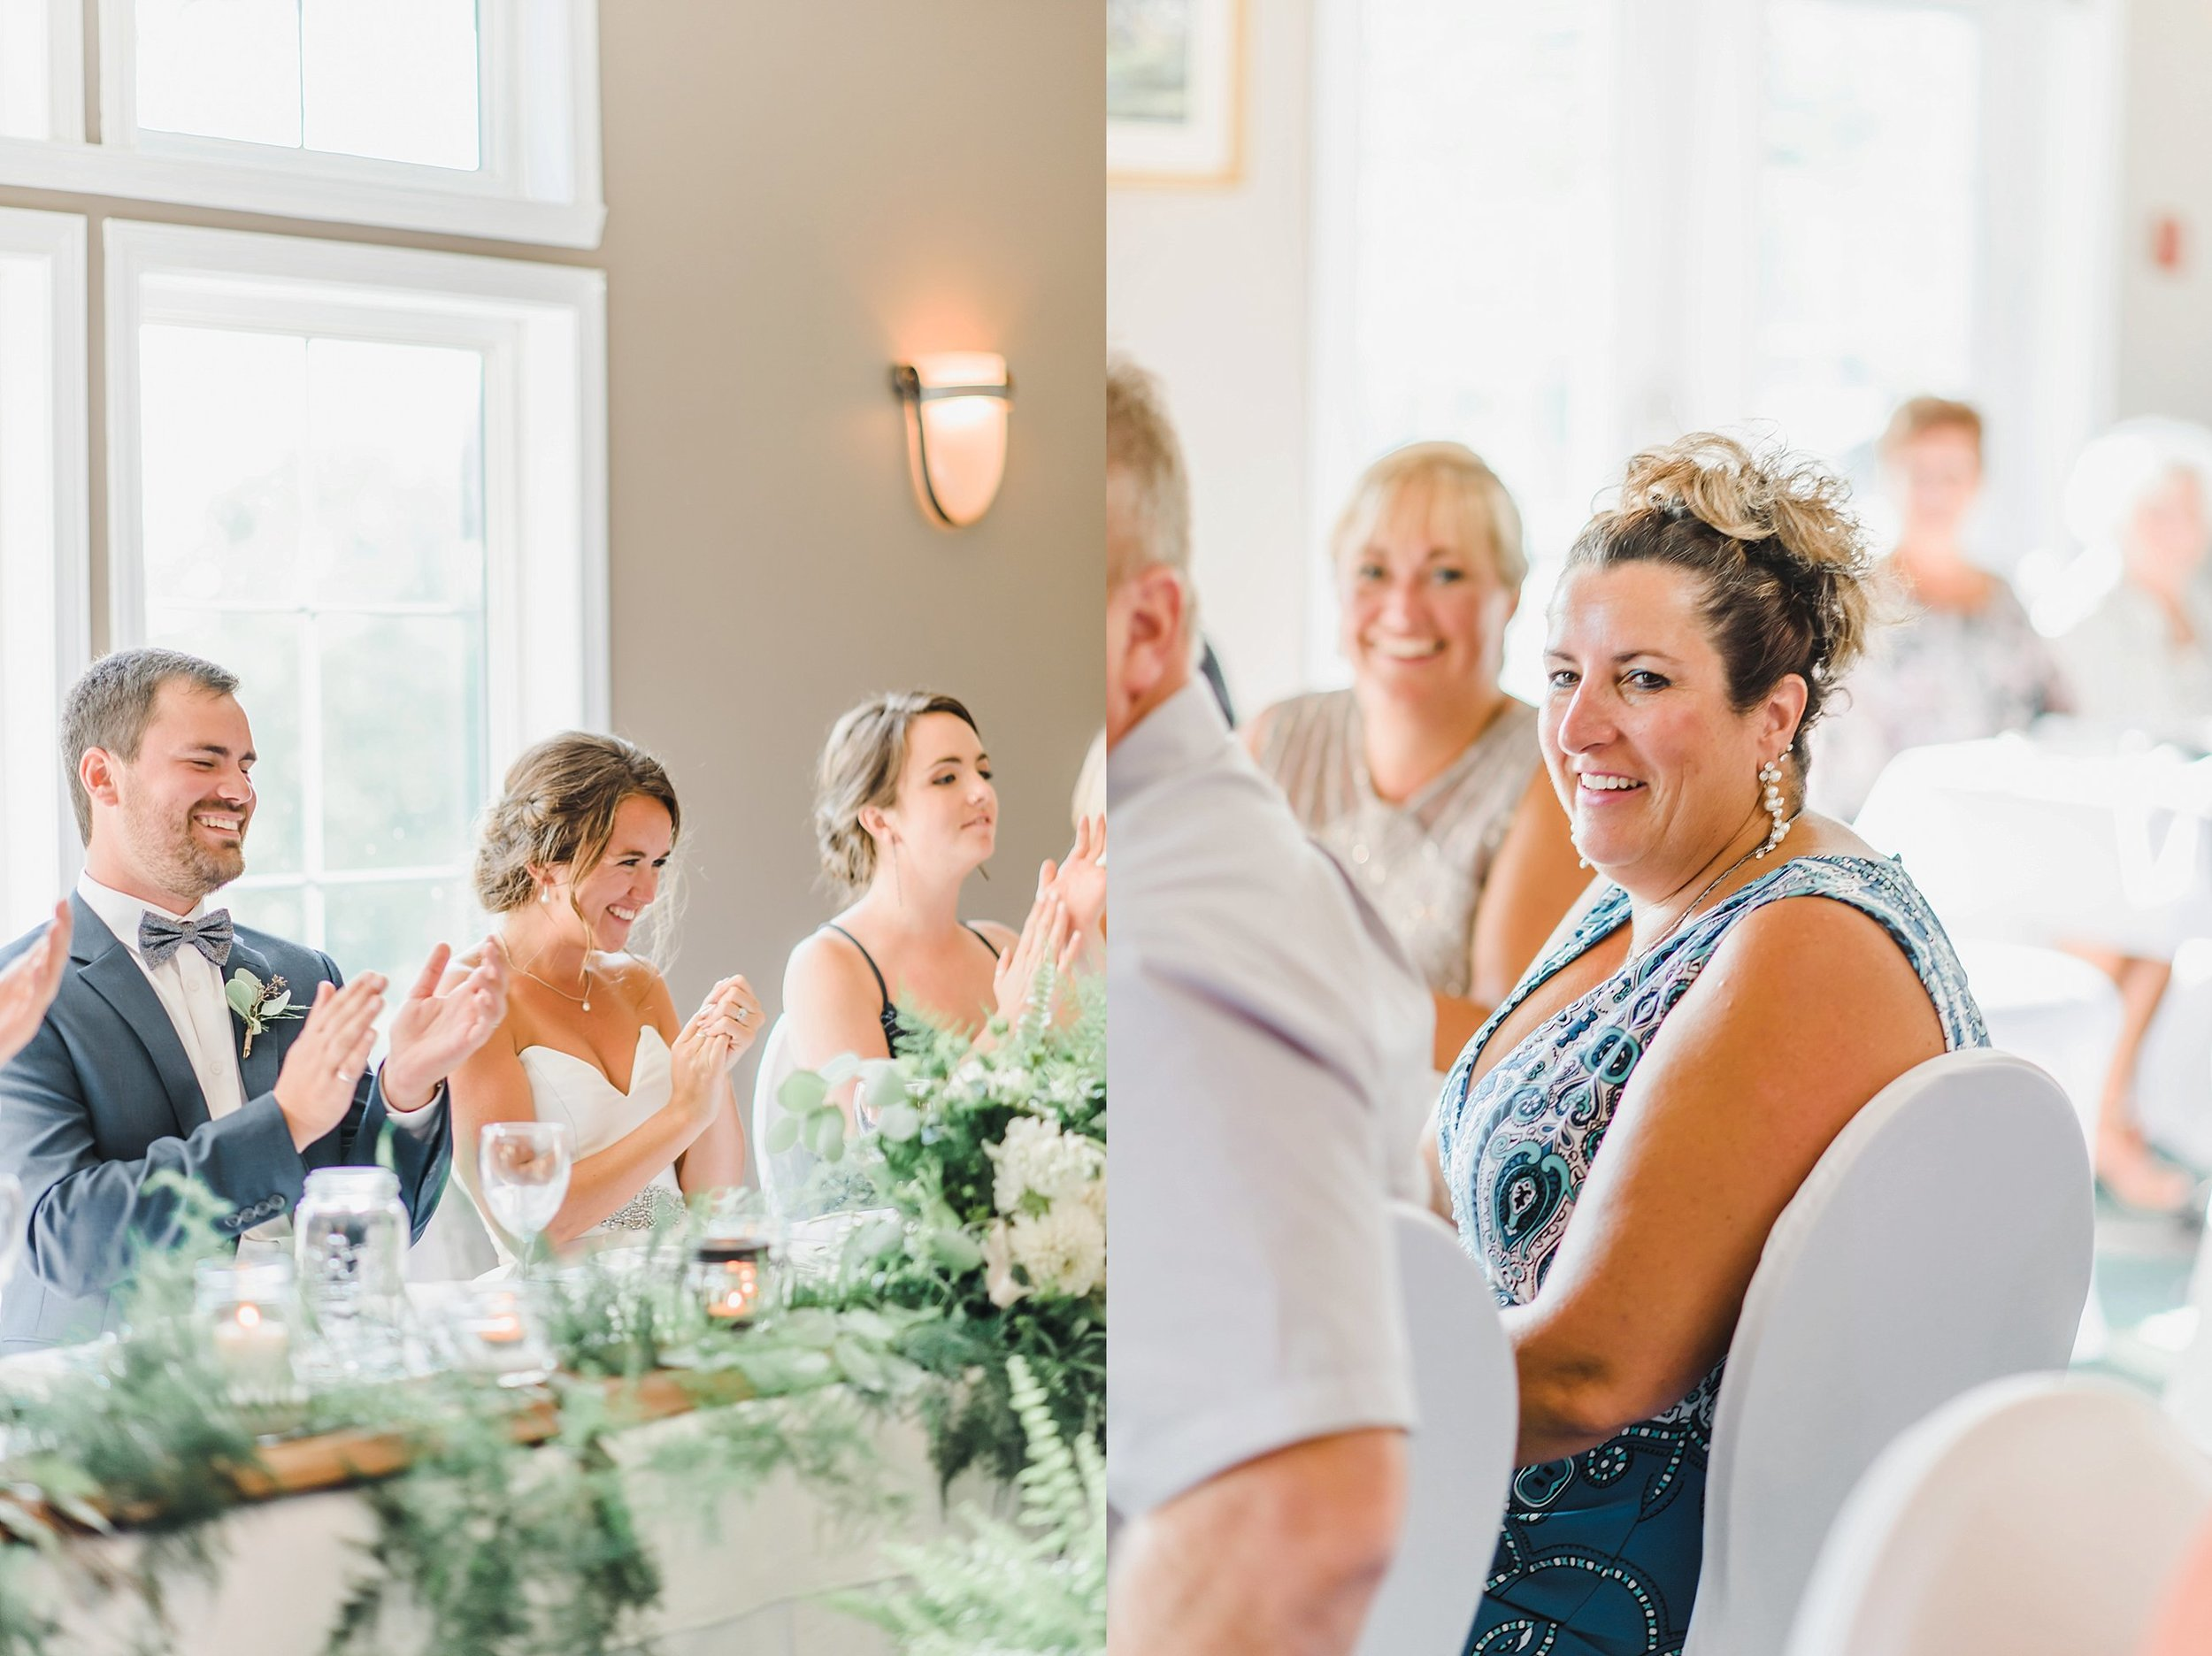 light airy indie fine art ottawa wedding photographer | Ali and Batoul Photography_0559.jpg